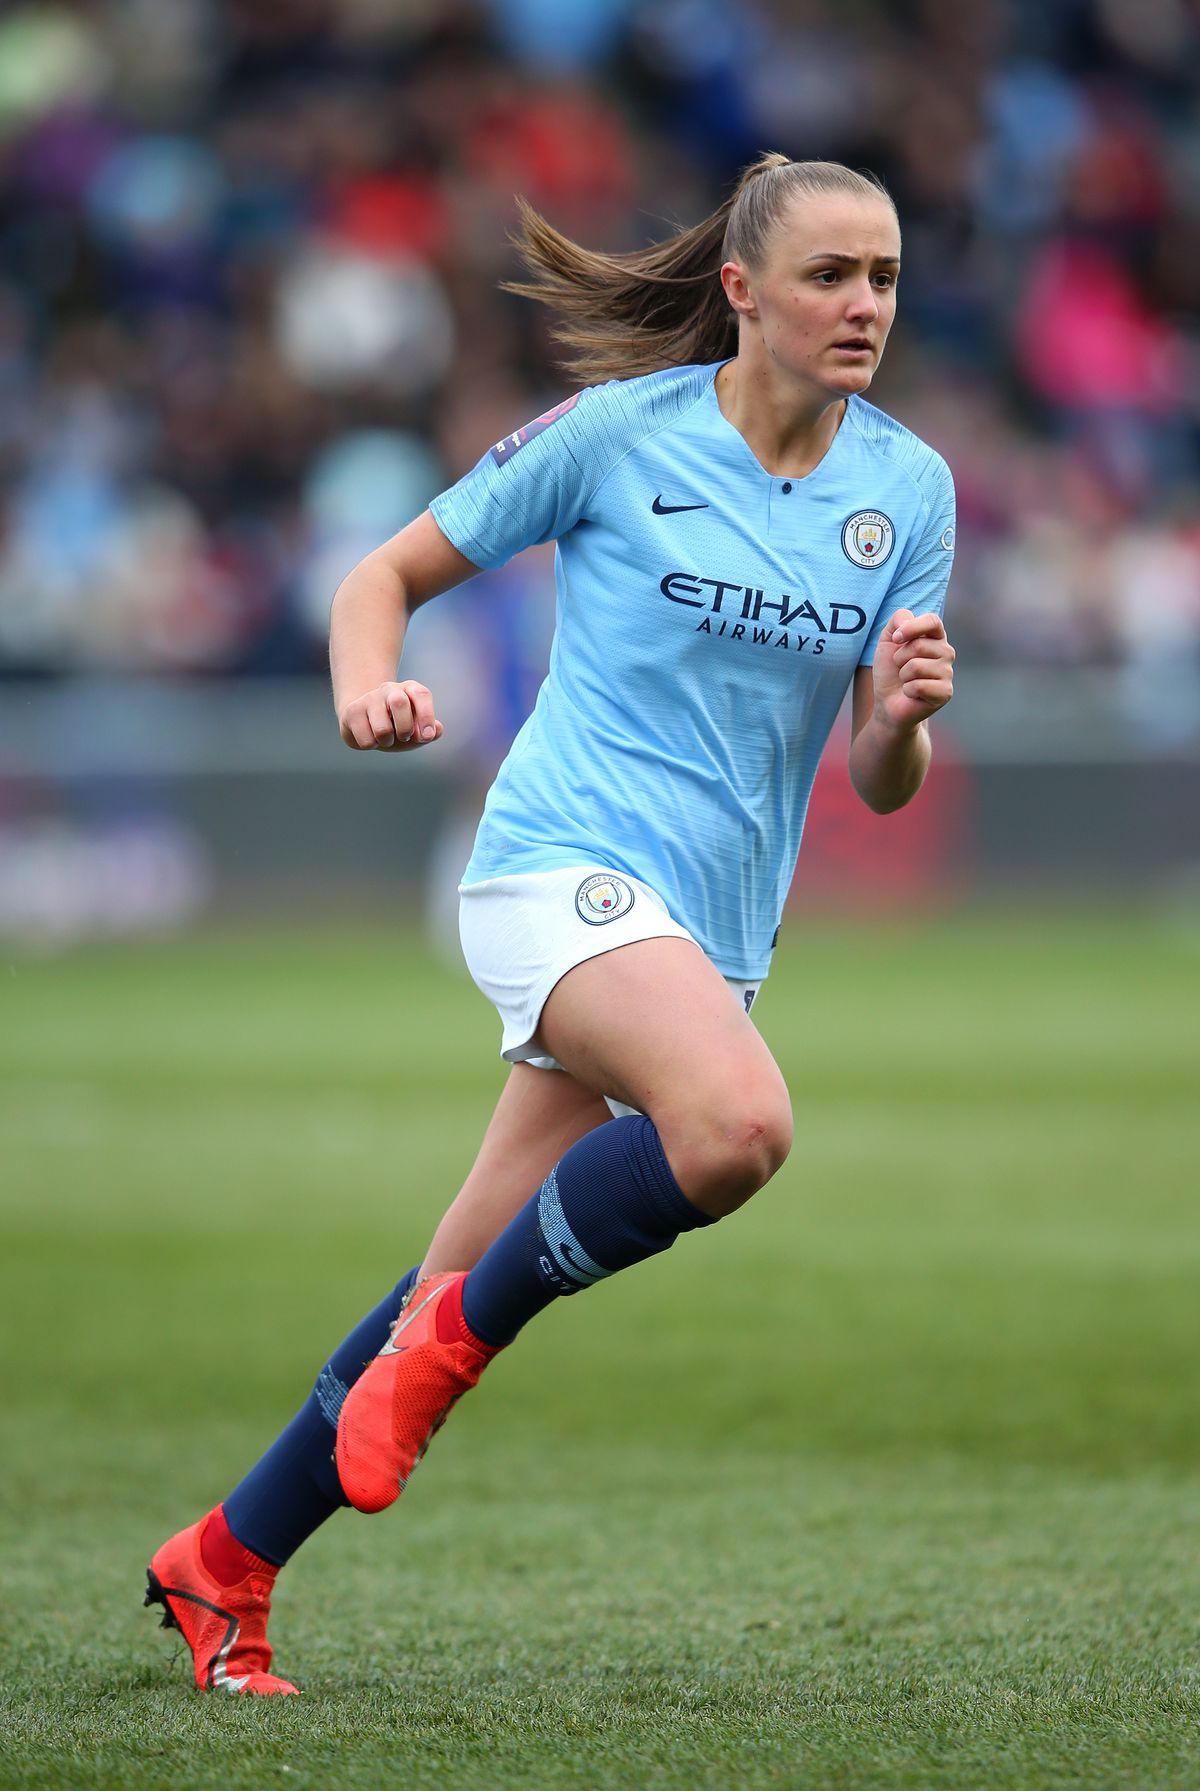 Manchester City Women v Chelsea Women - Women's FA Cup Semi Final